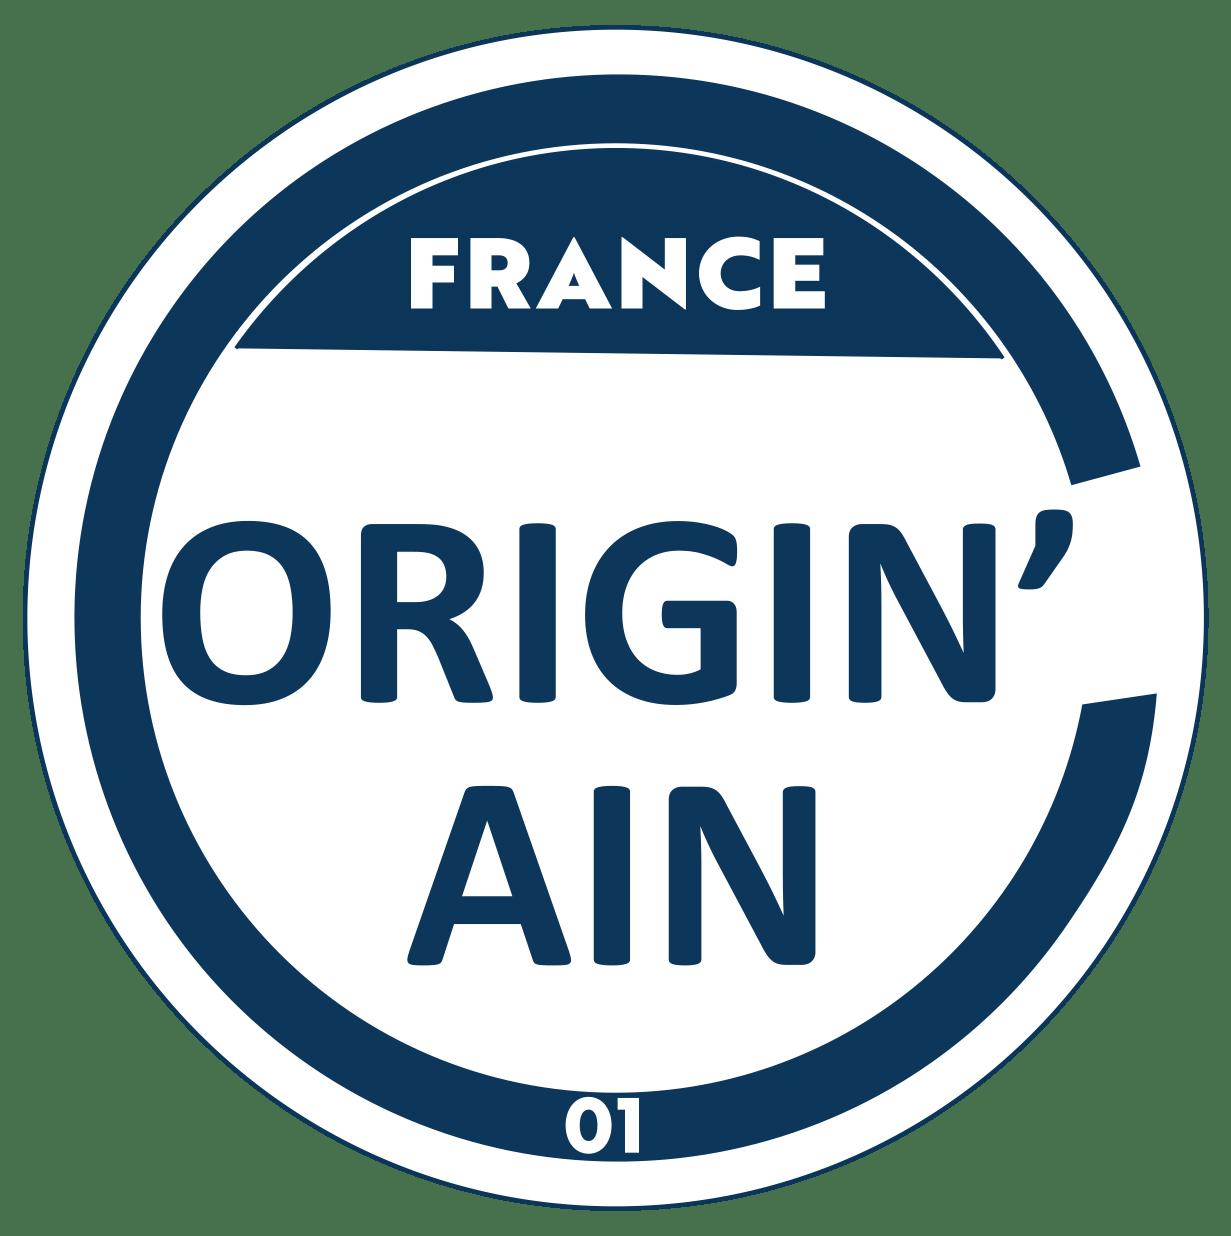 Originain_Blanc_vecto